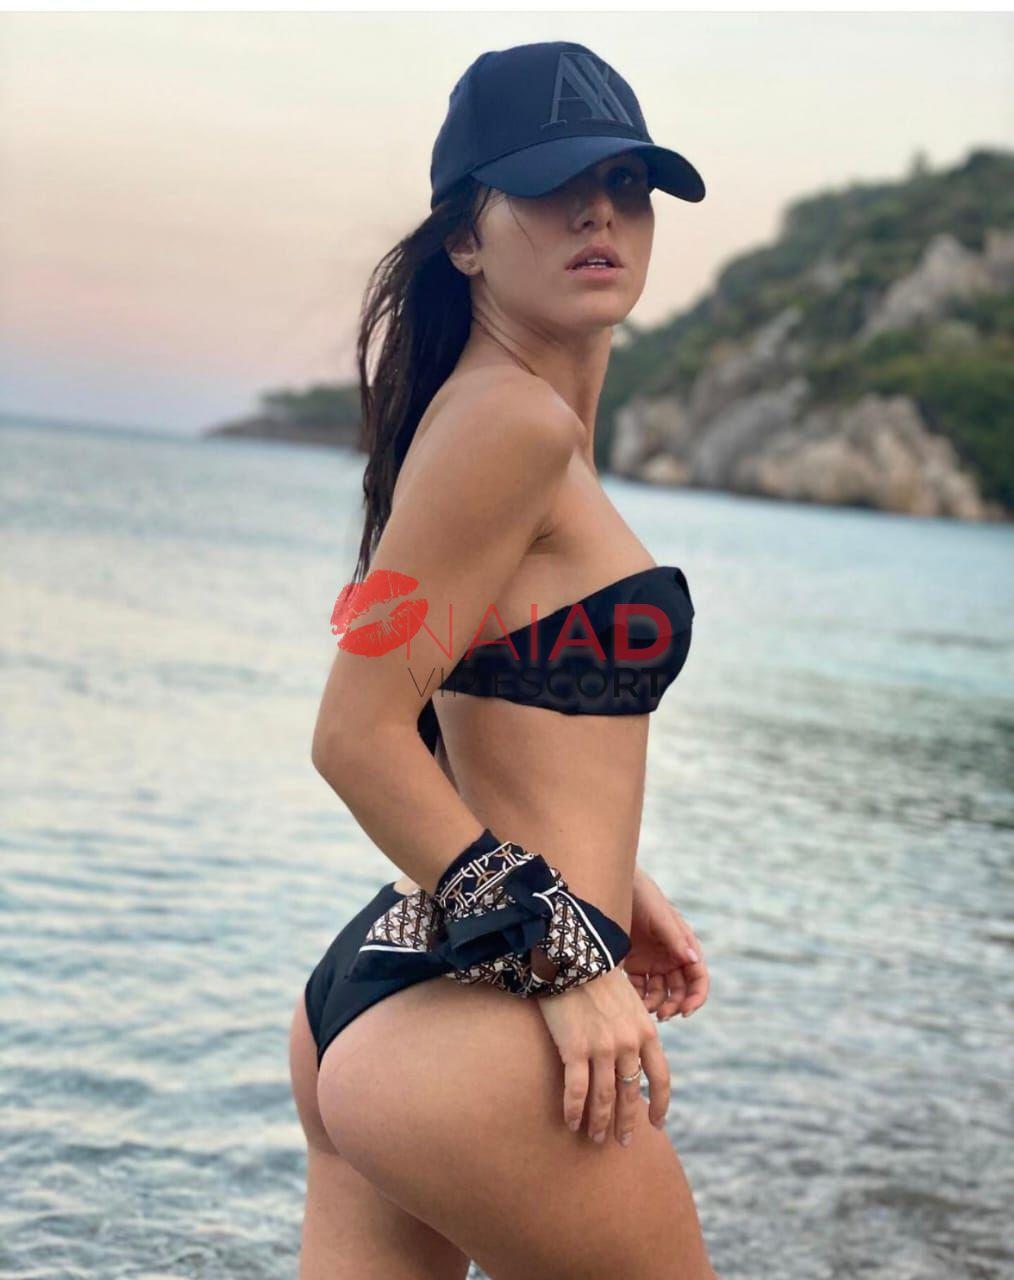 Image of Lola on Naiad